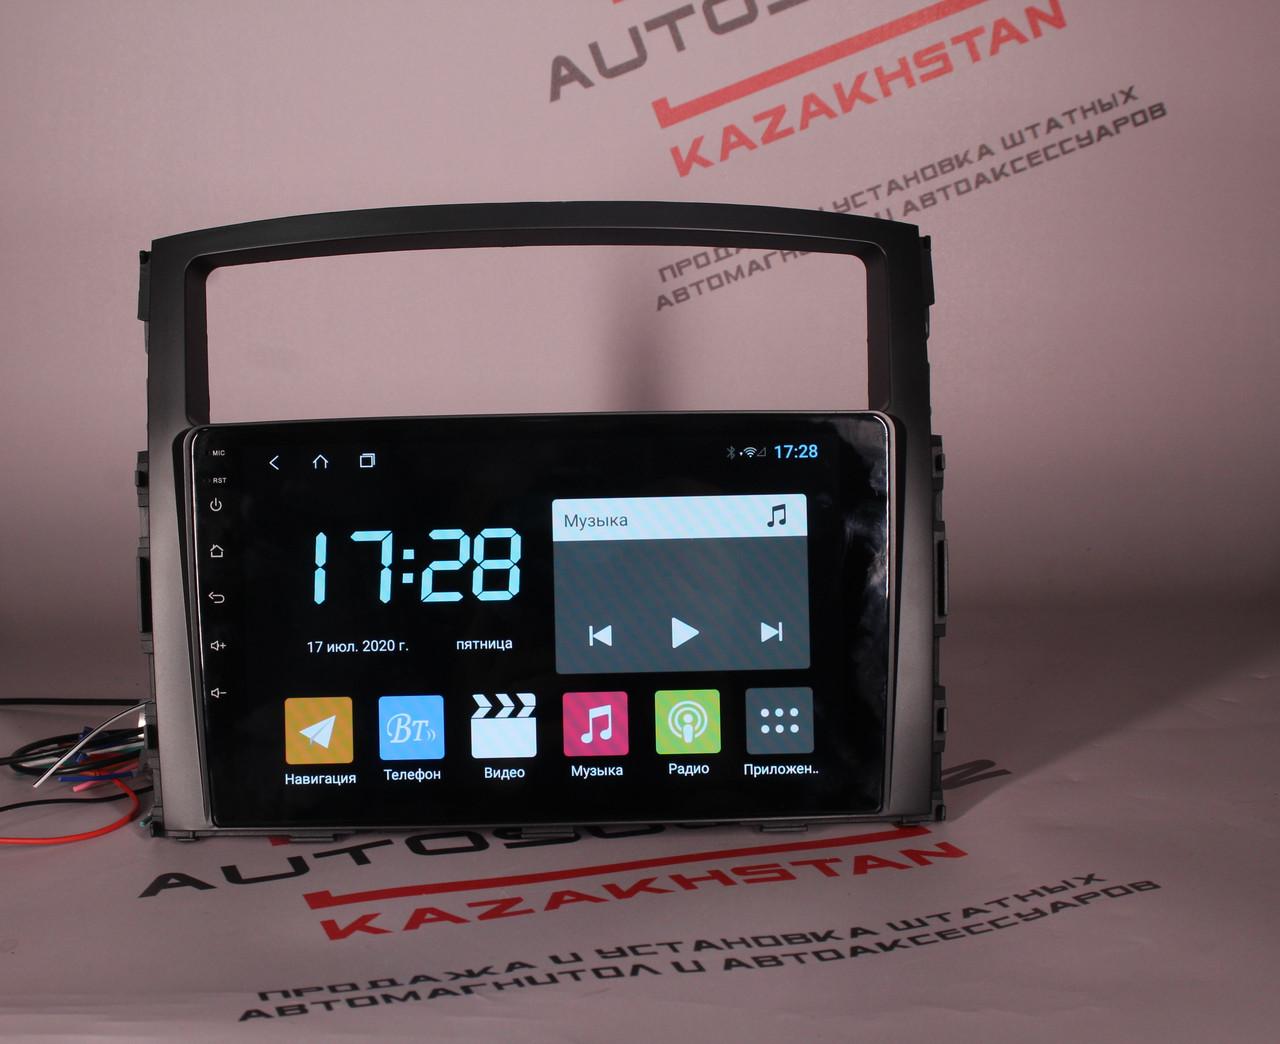 Автомагнитола Mitsubishi Pajero 4 android Vi Tech ANDROID